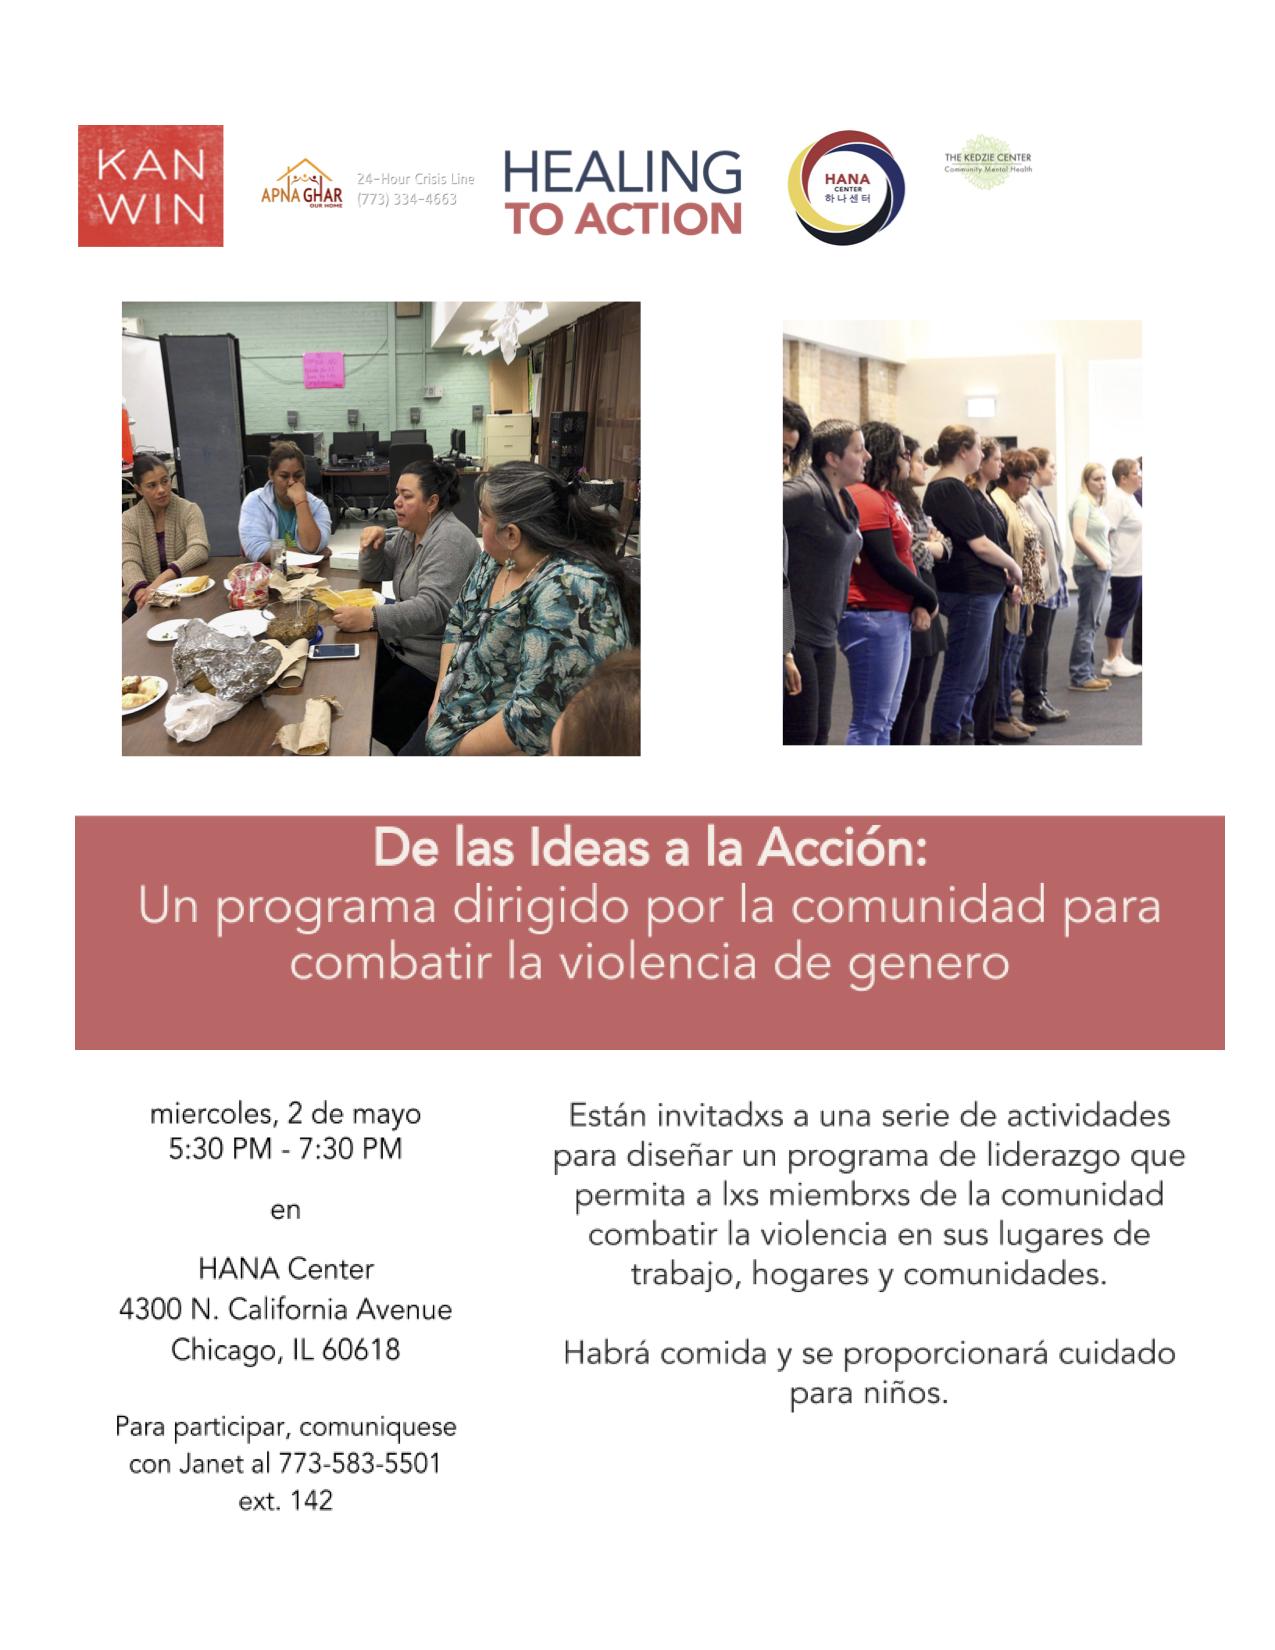 Healting to Action Flyer-Spanish.jpg